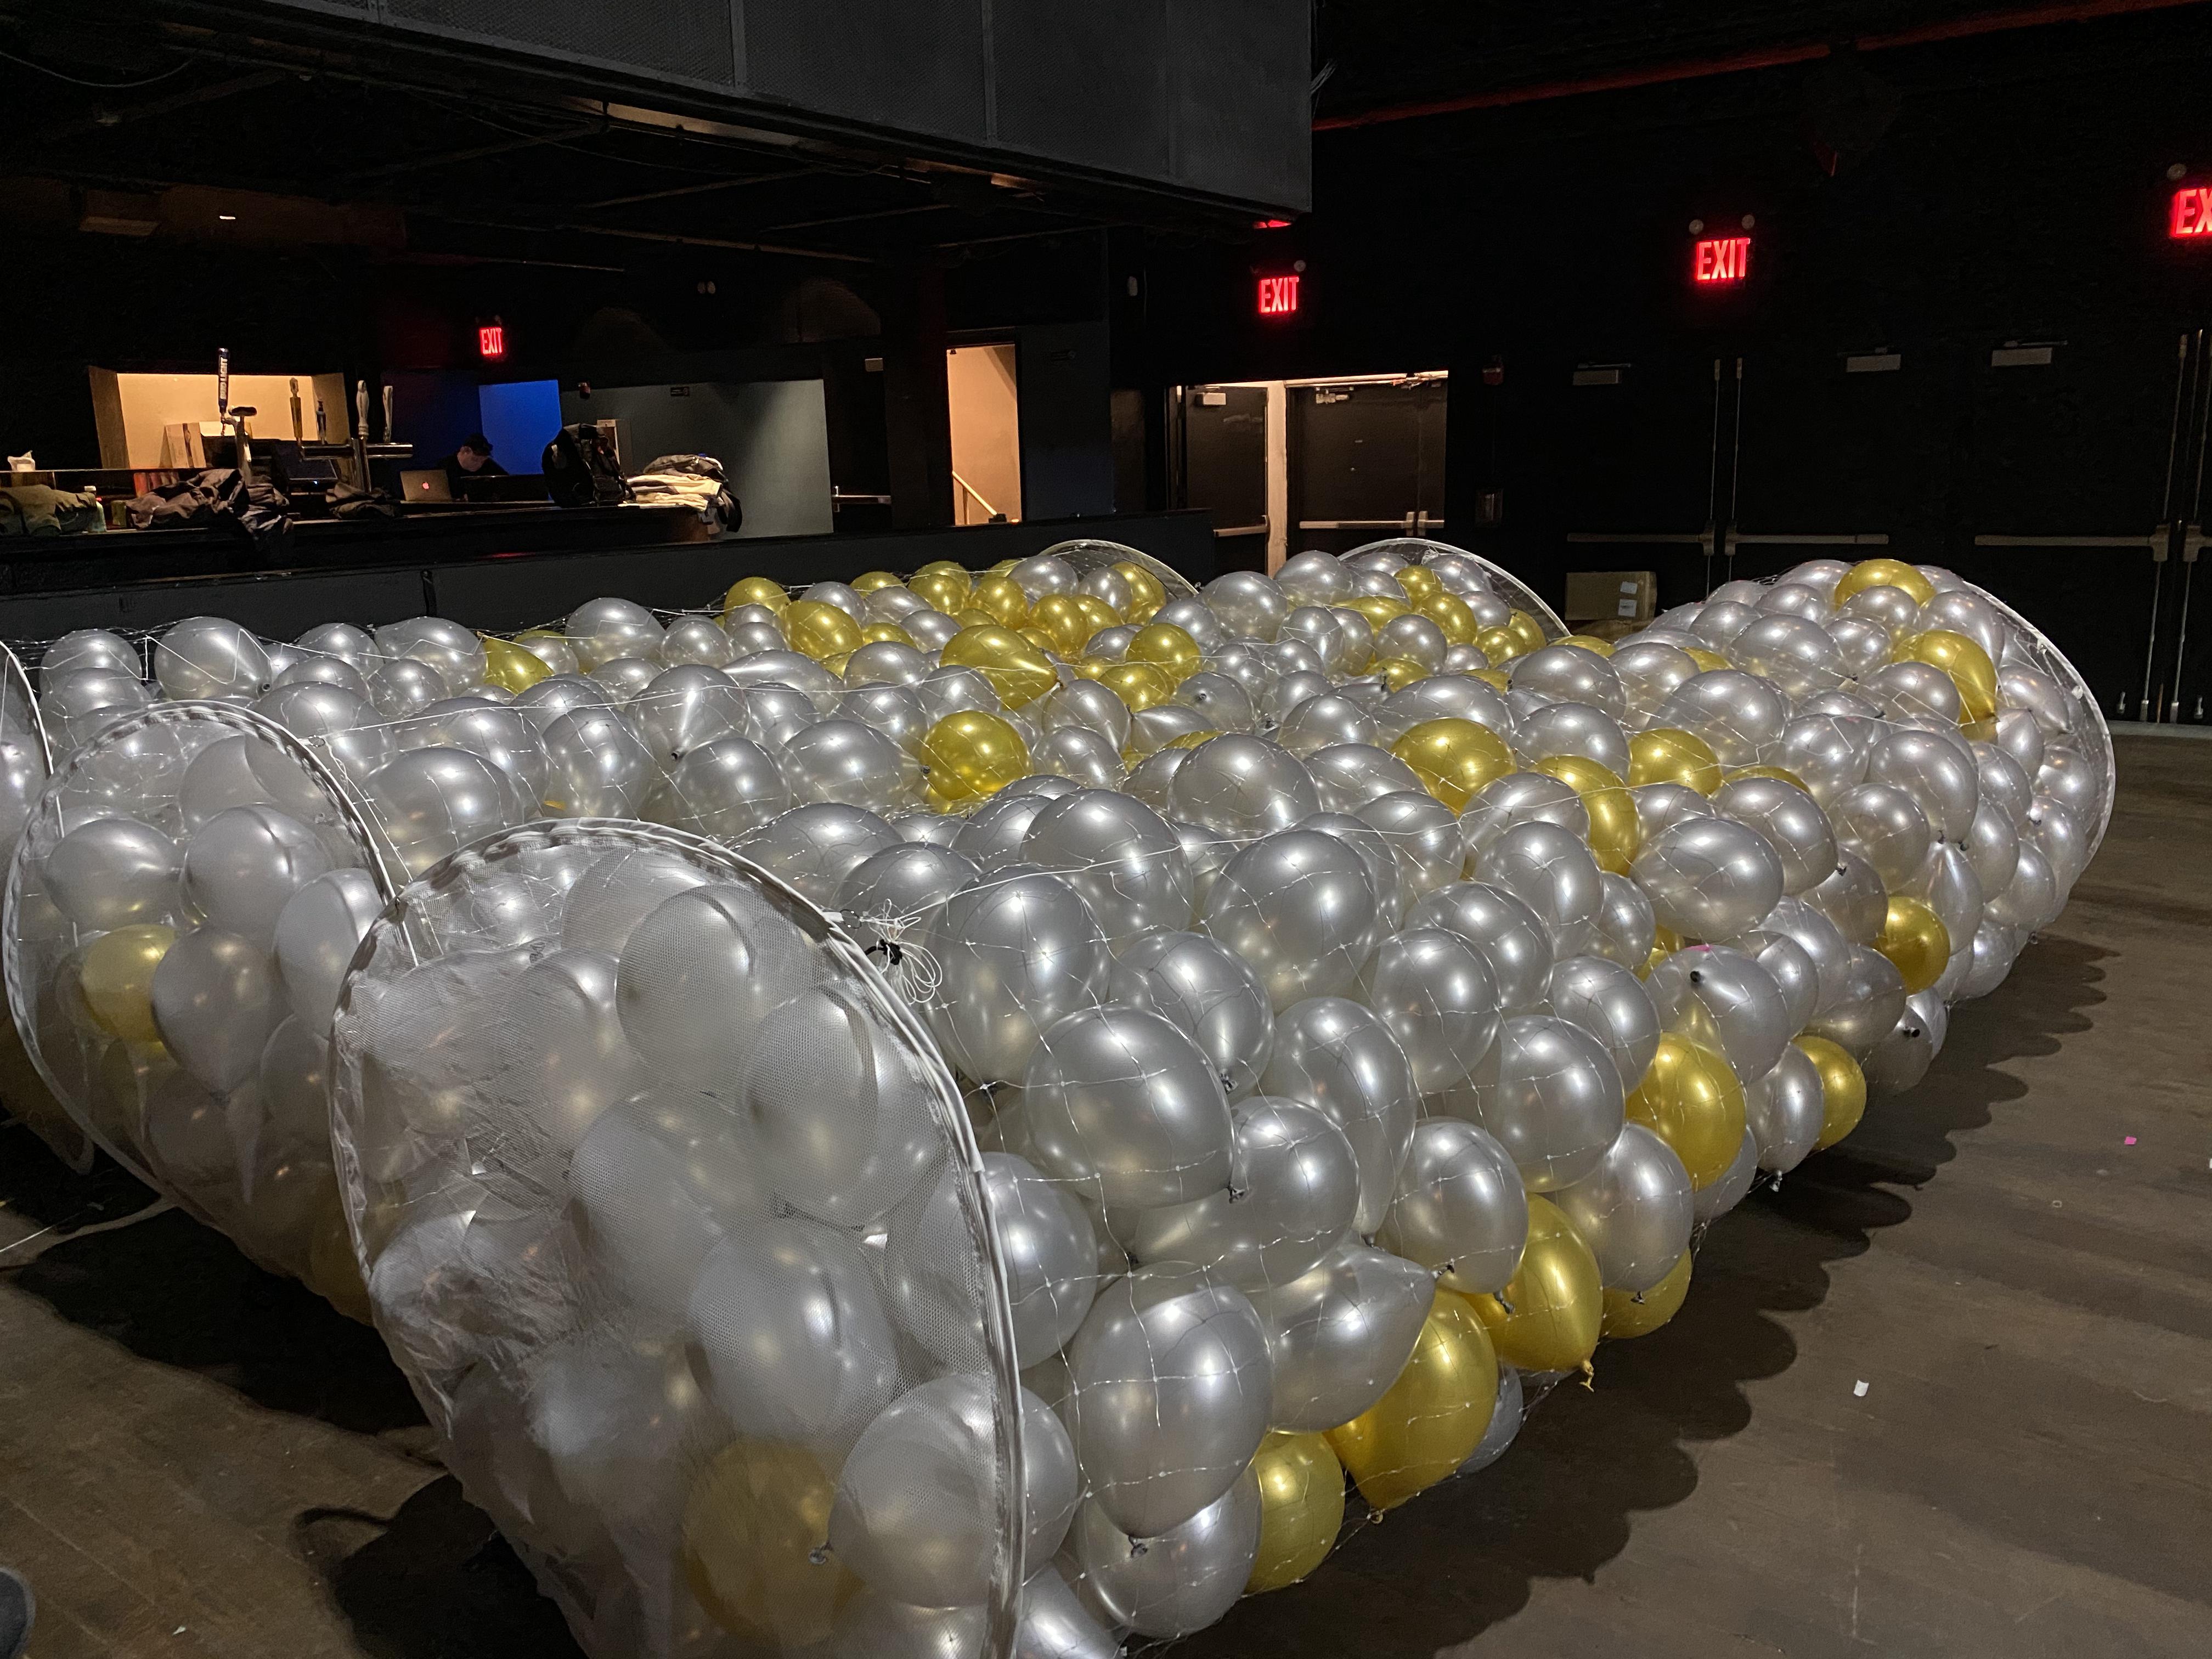 balloons ready for big balloon drop NYC.